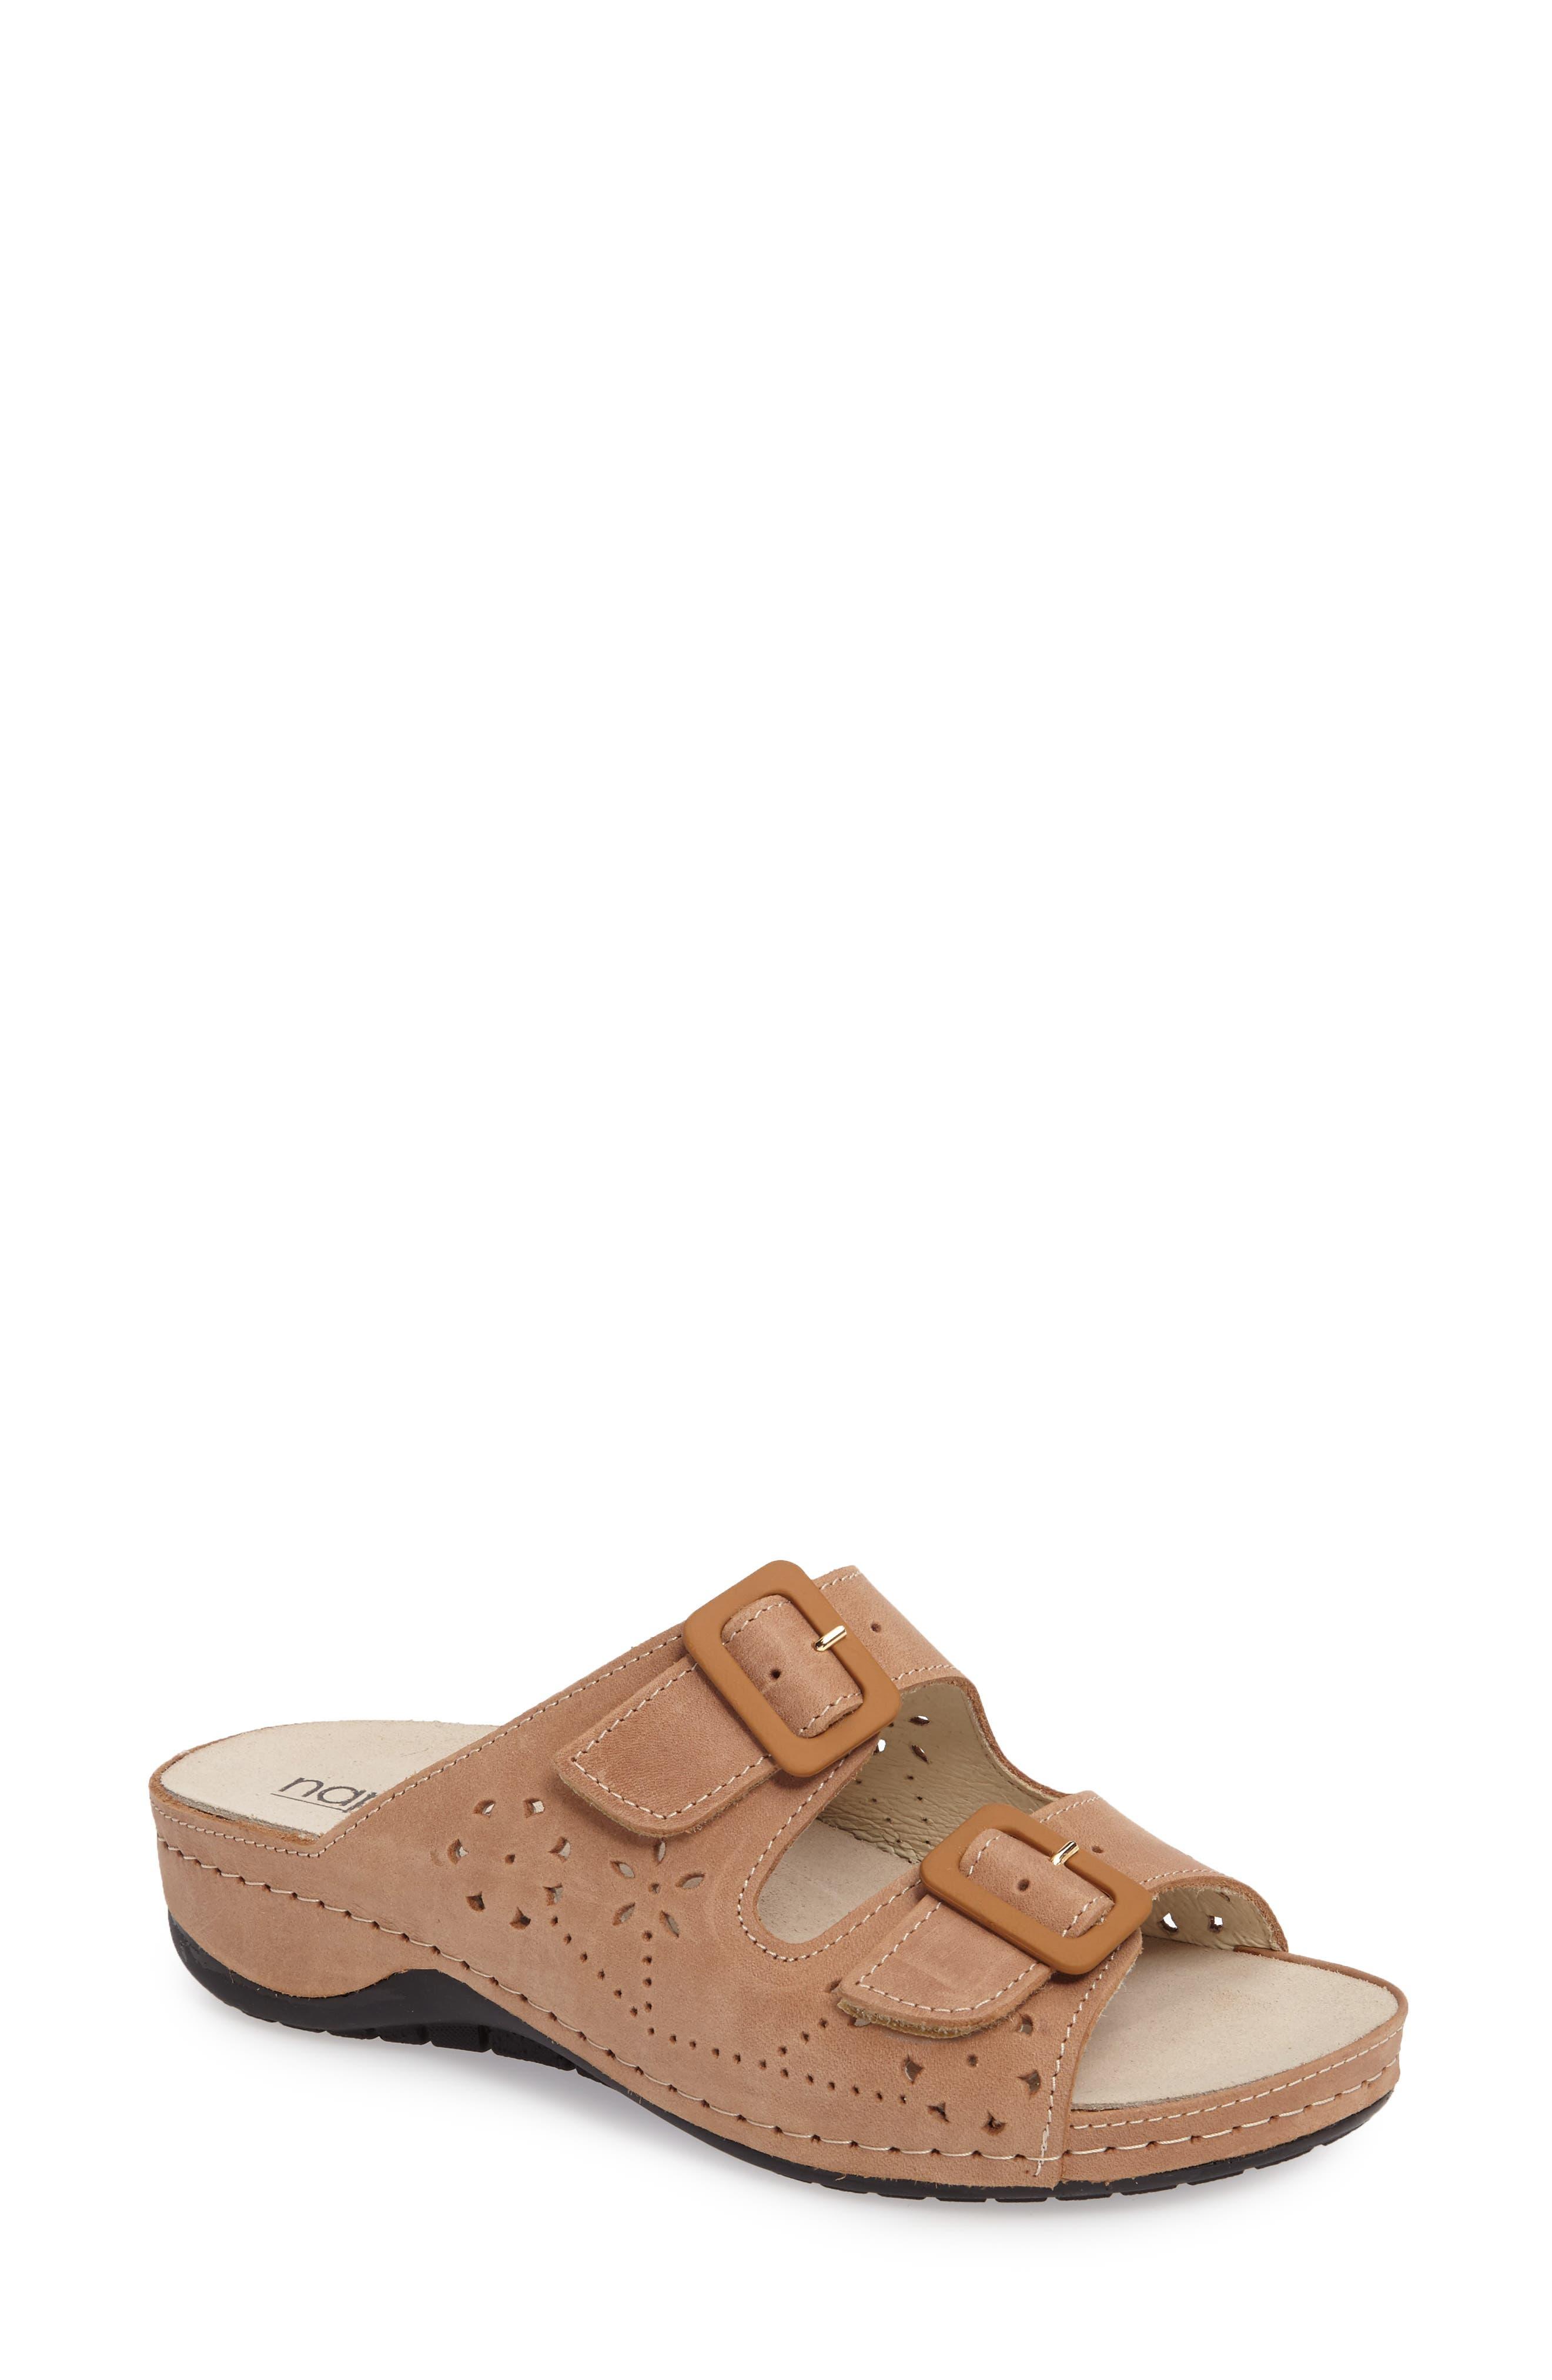 Alternate Image 1 Selected - Napa Flex Double Strap Slide Sandal (Women)